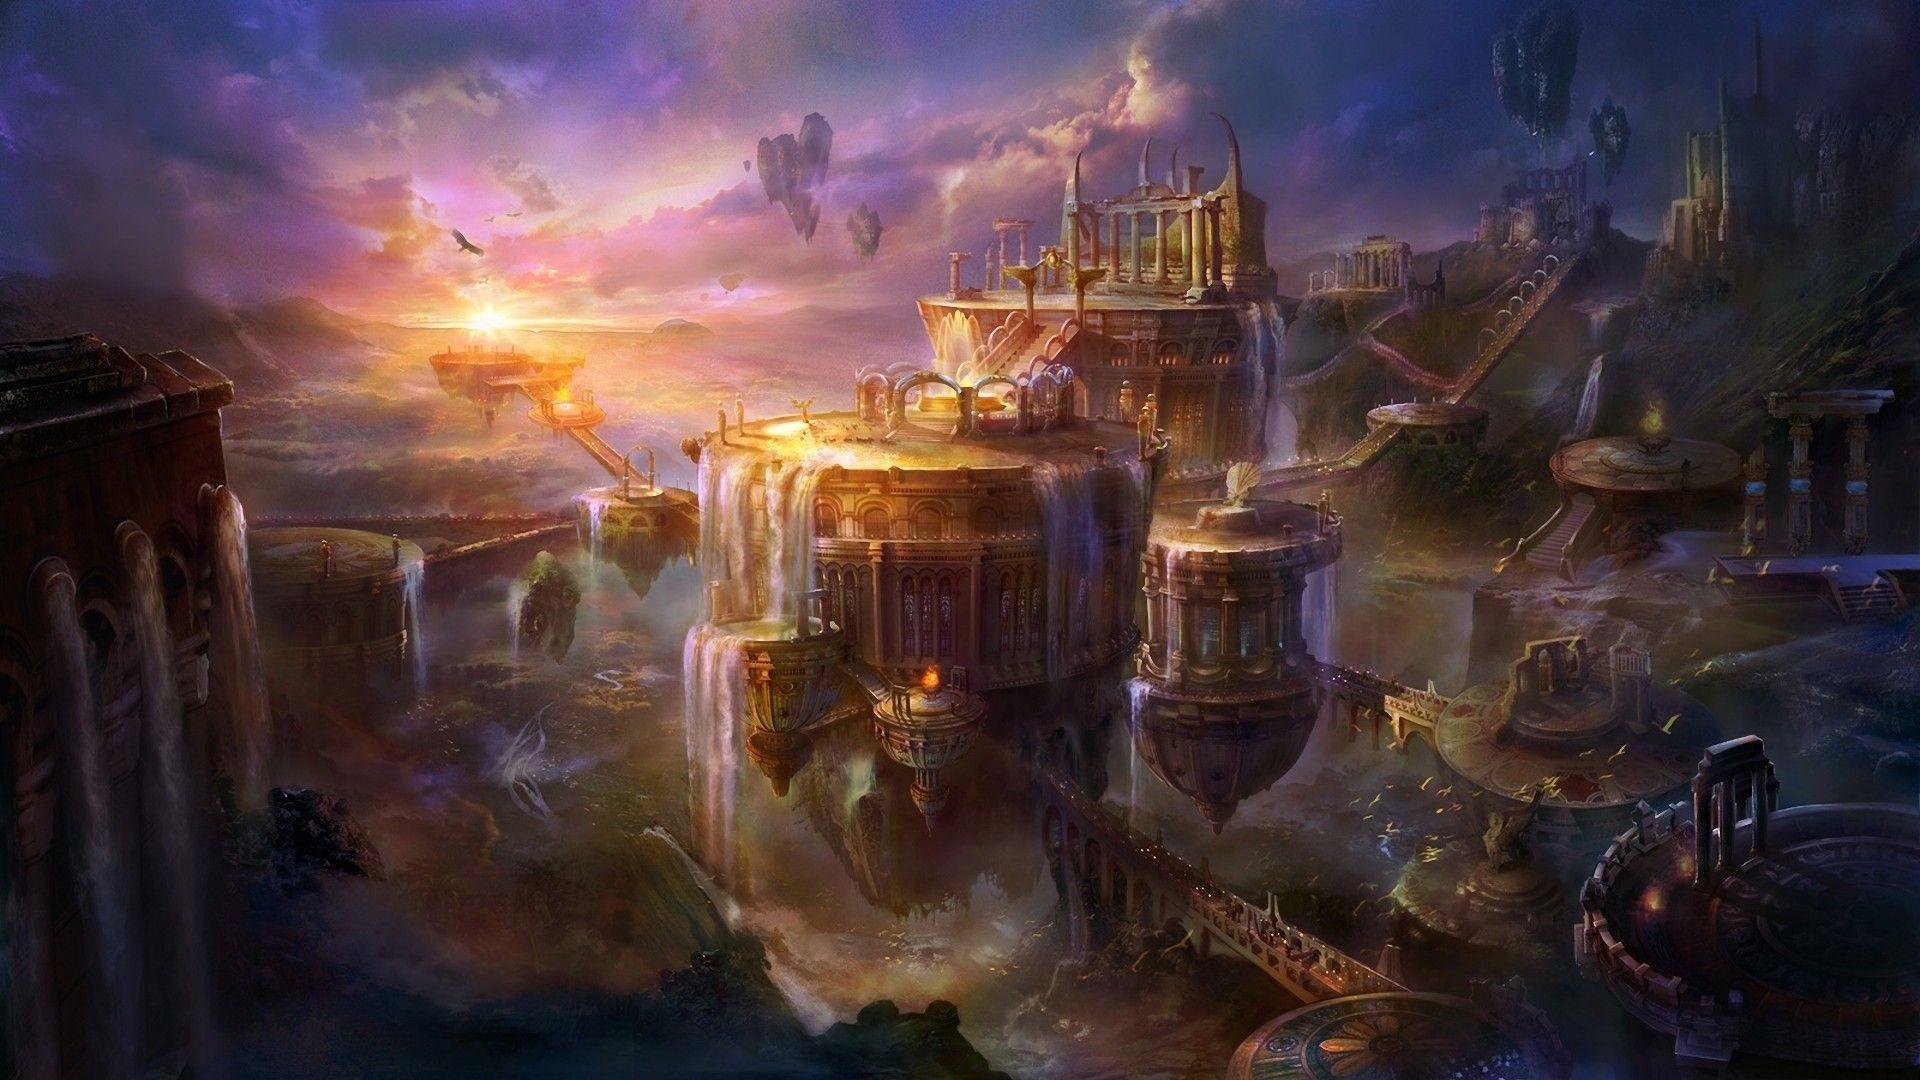 Epic Fantasy Wallpaper High Definition #hYqcA